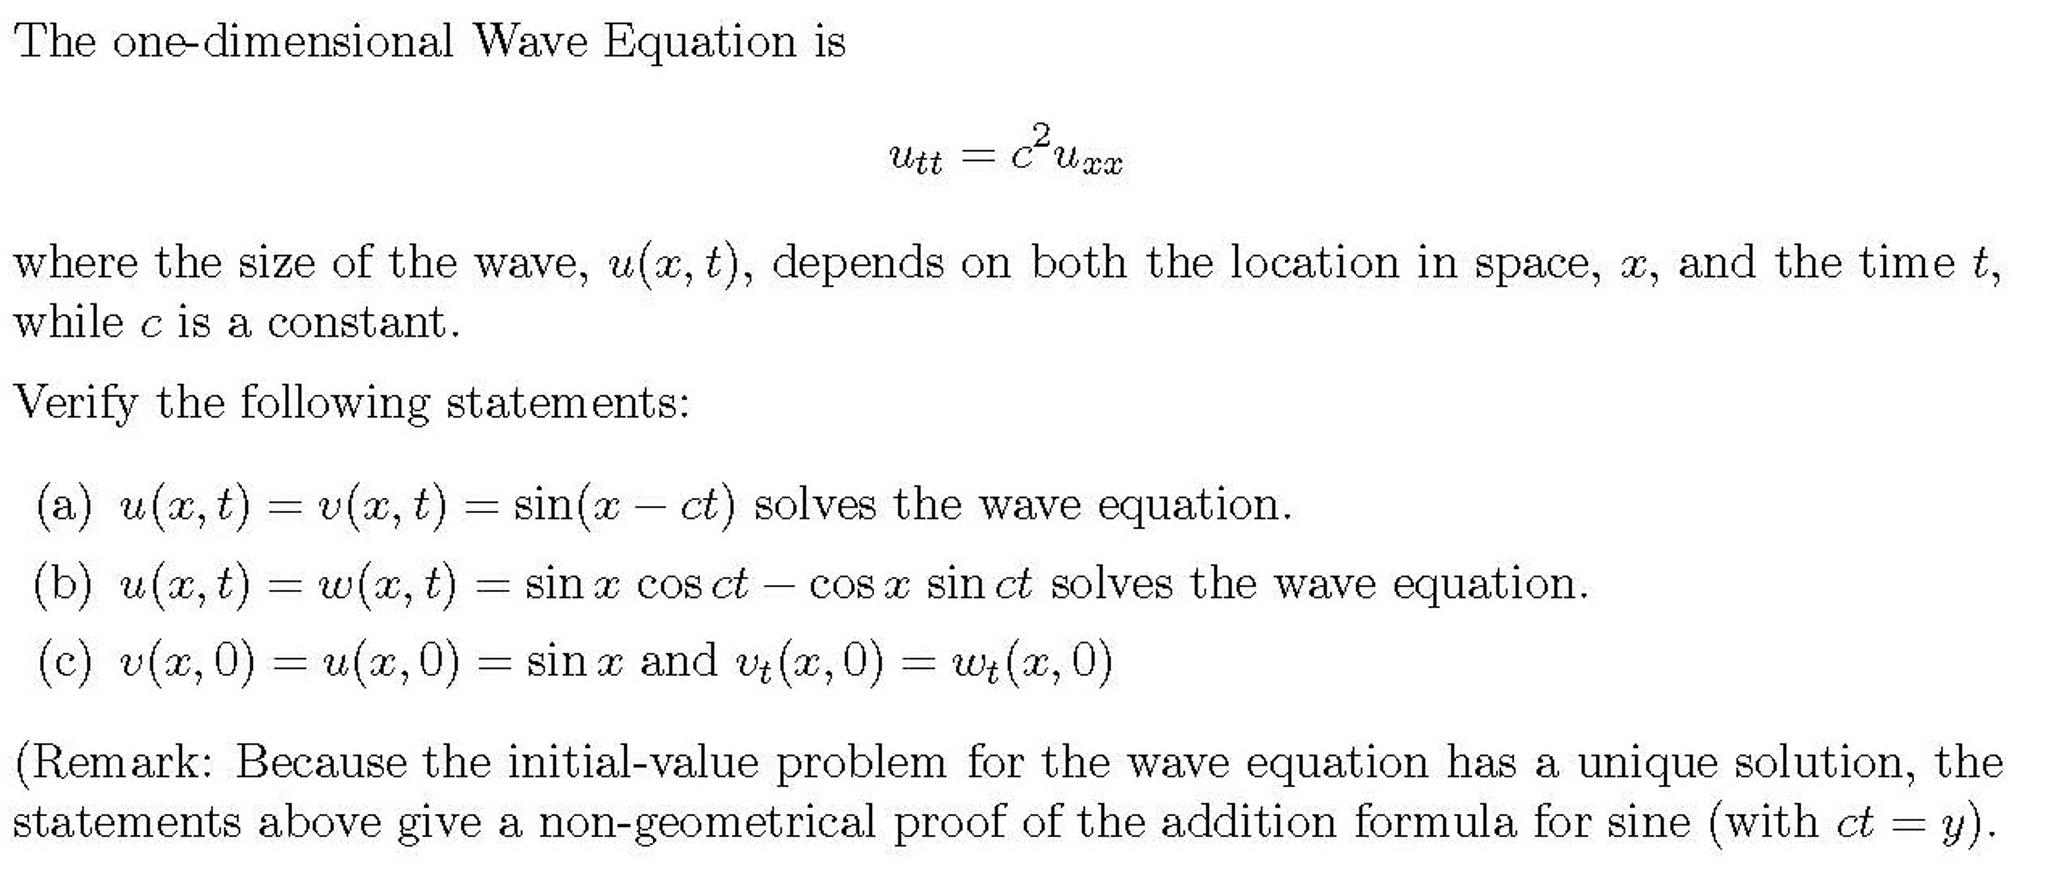 Solved: The One-dimensional Wave Equation Is U_tt = C^2u_x